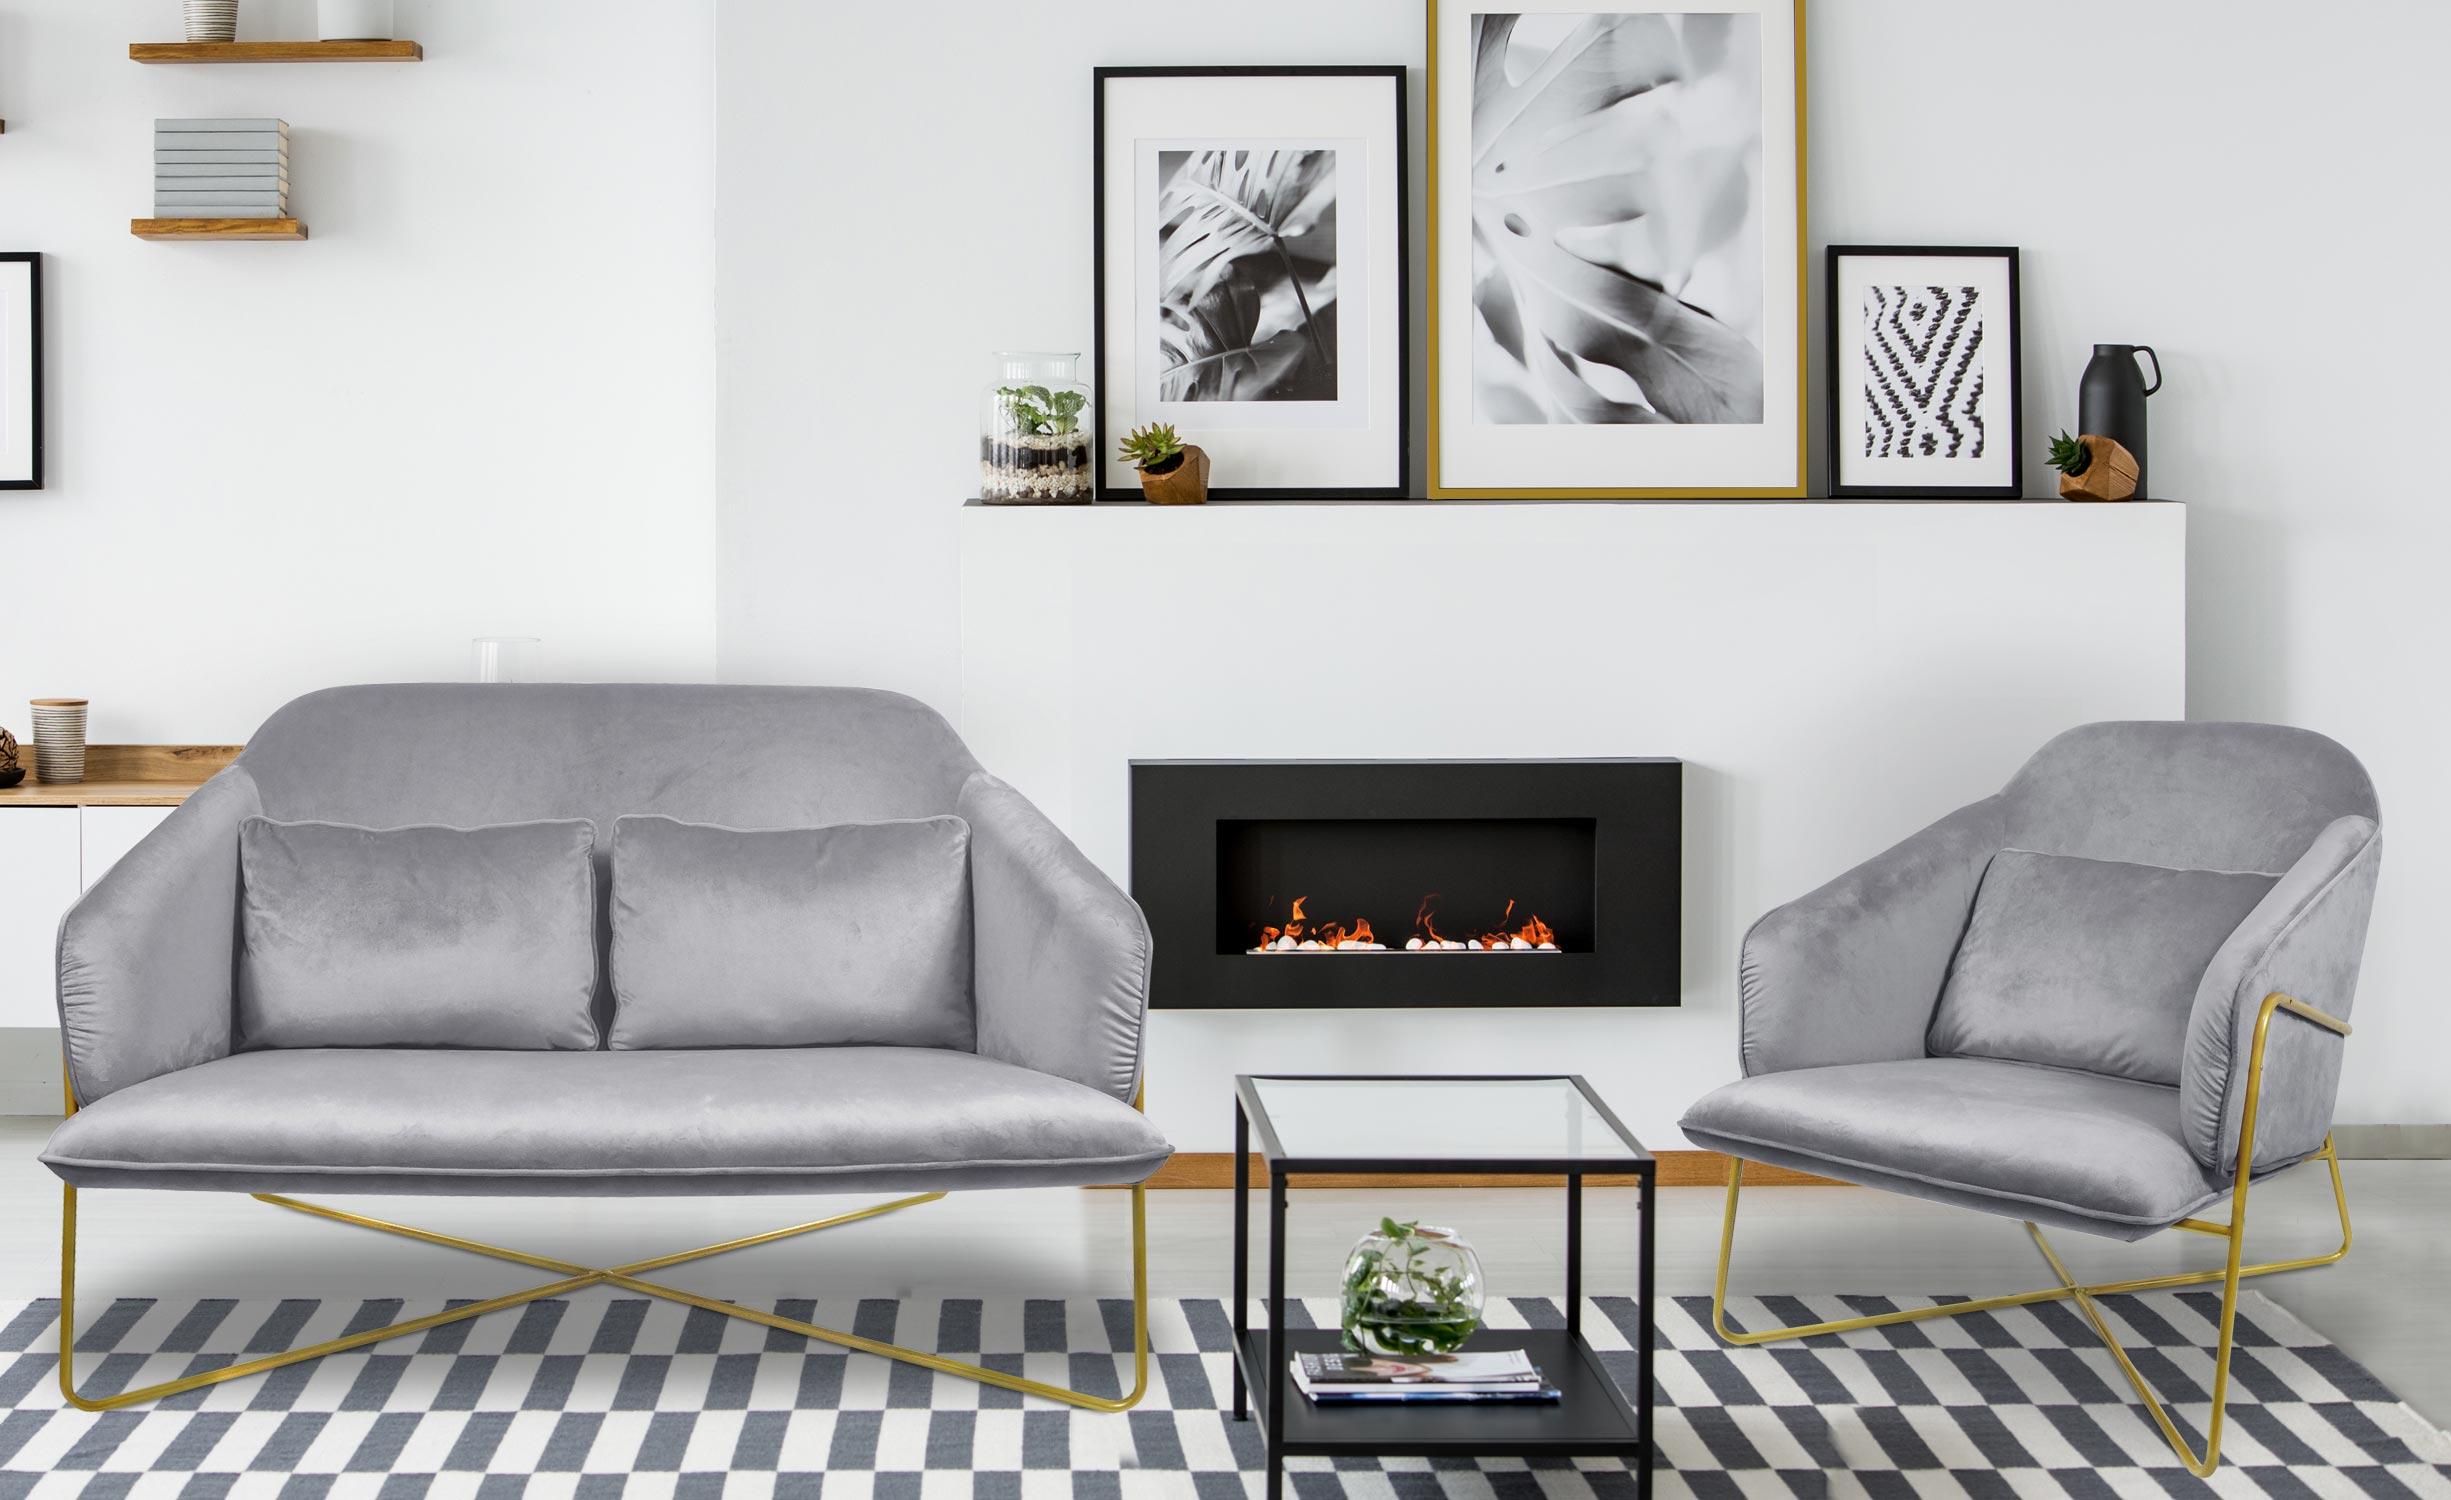 Starlight 2-Sitzer Sofa mit Samtbezug Rosa